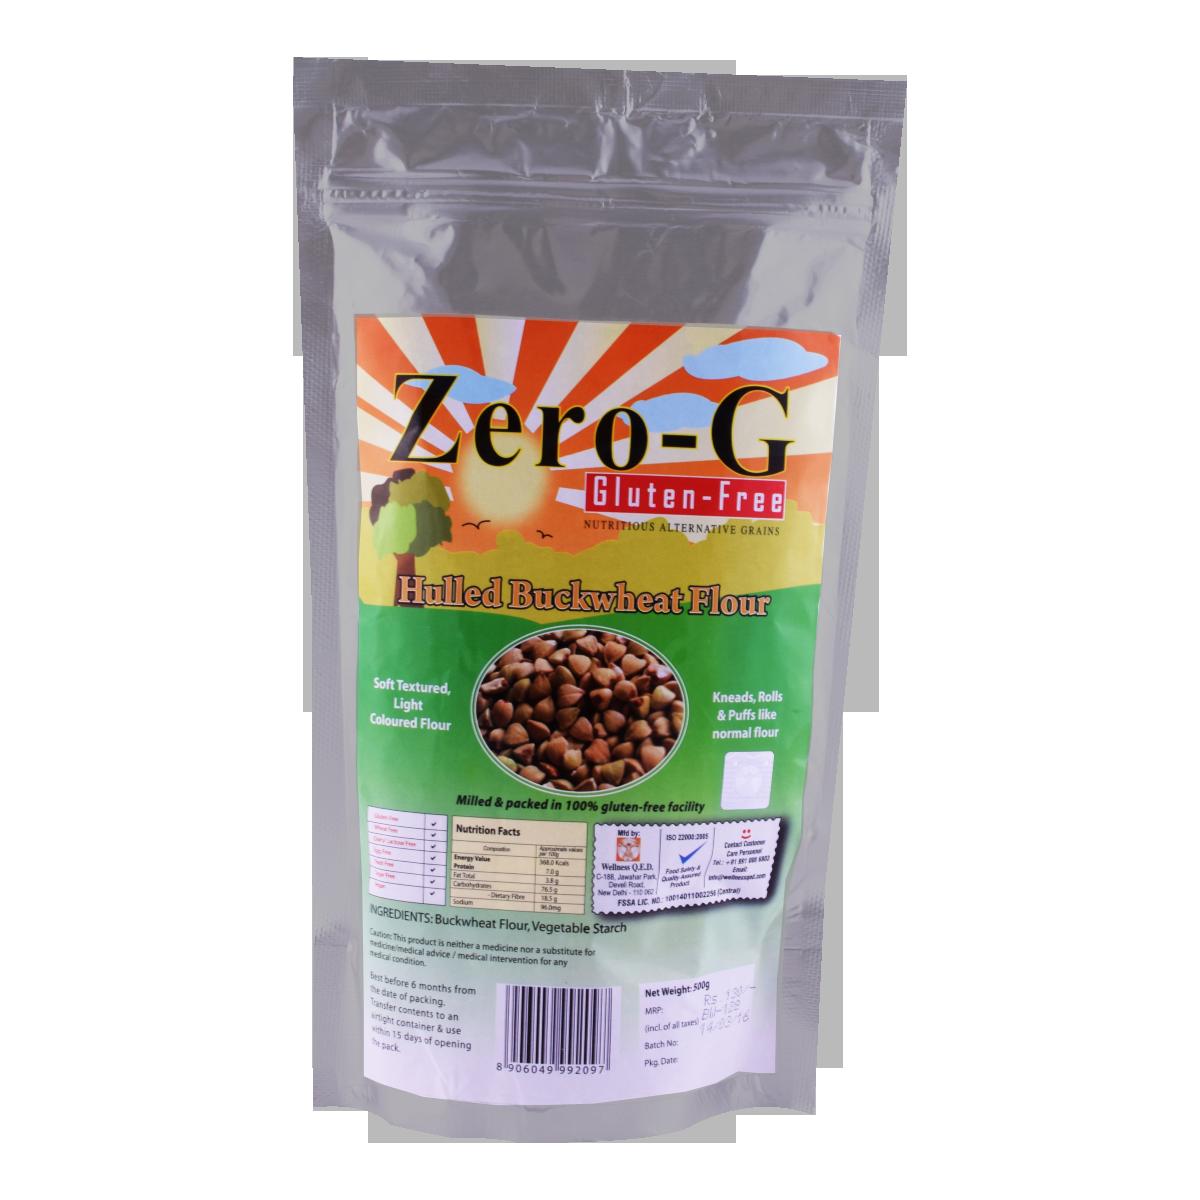 Zero-G Hulled Buckwheat Flour